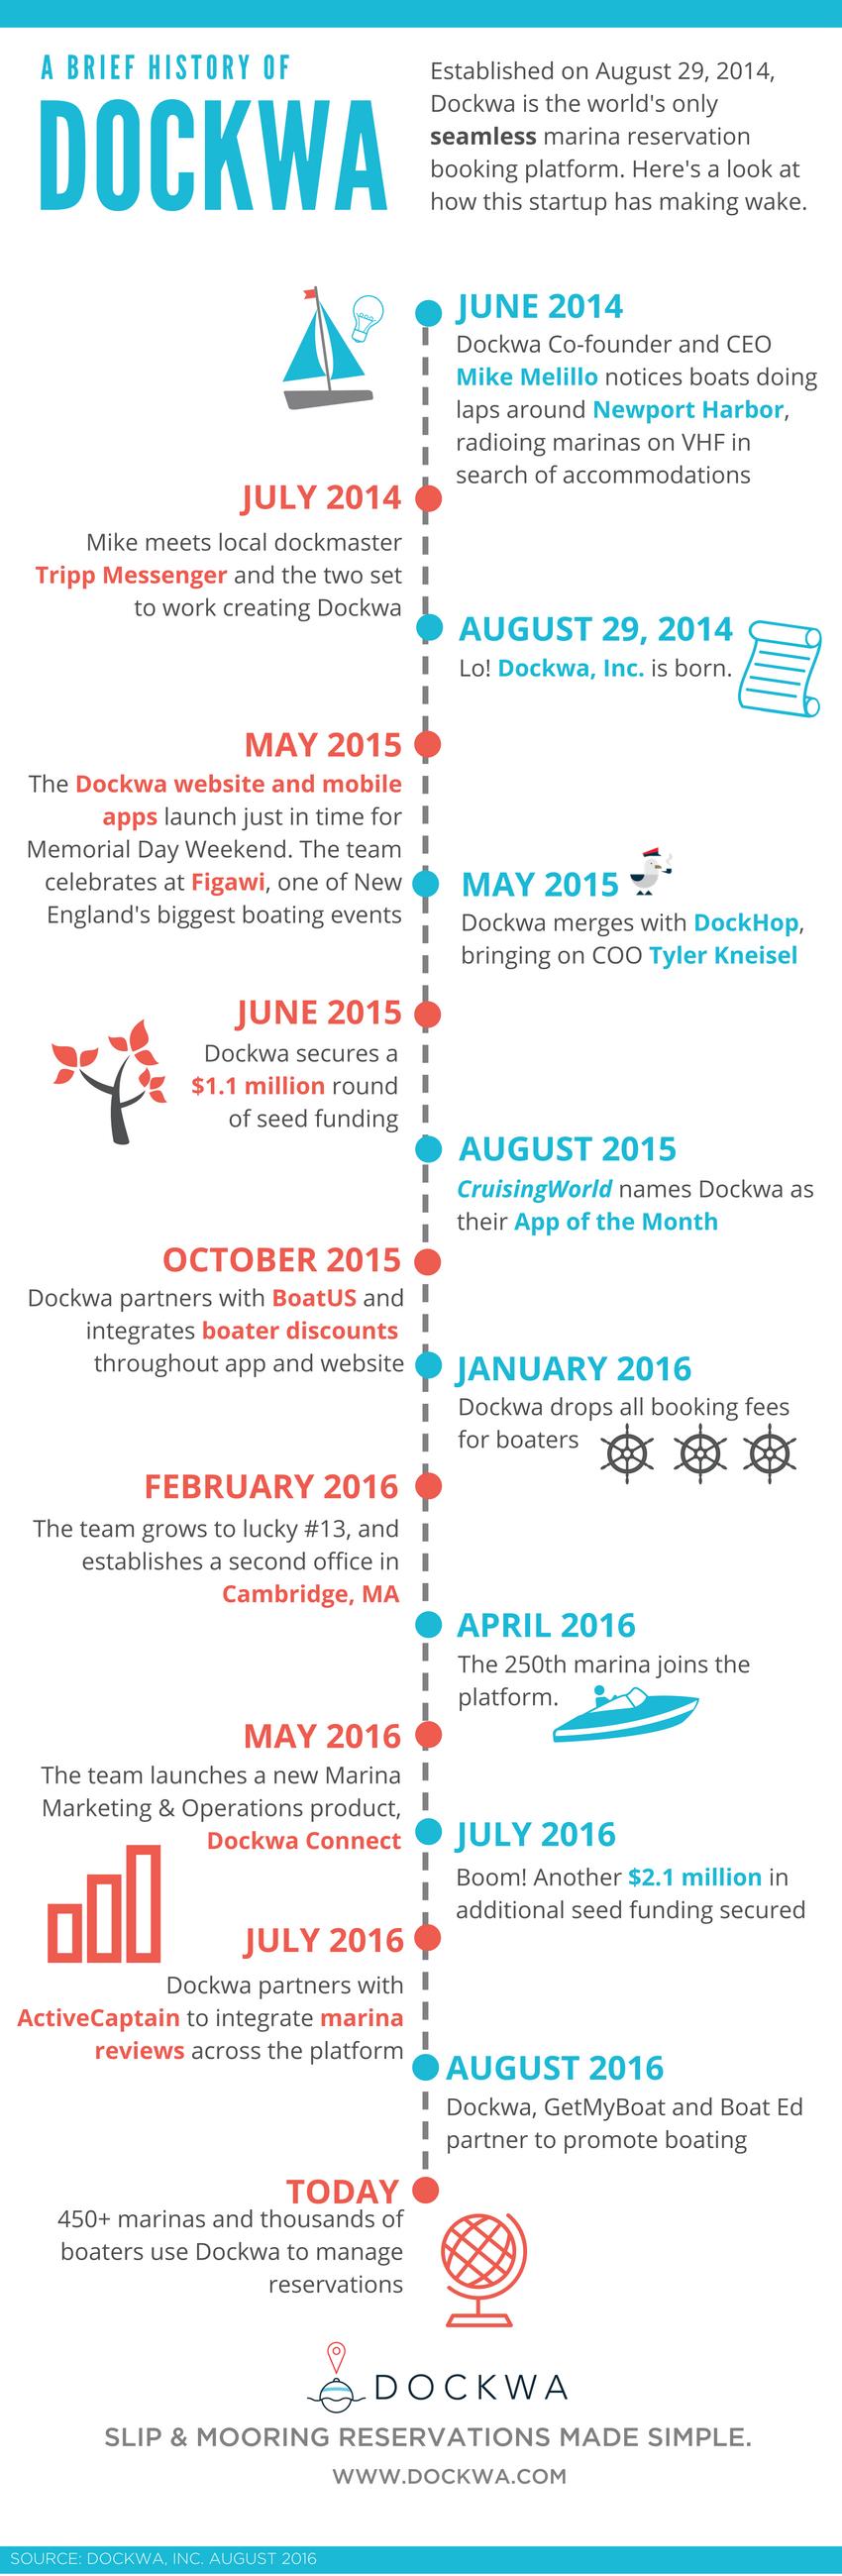 Dockwa_Birthday_82F292F2016_-_Infographic_1-_Timeline_4.png